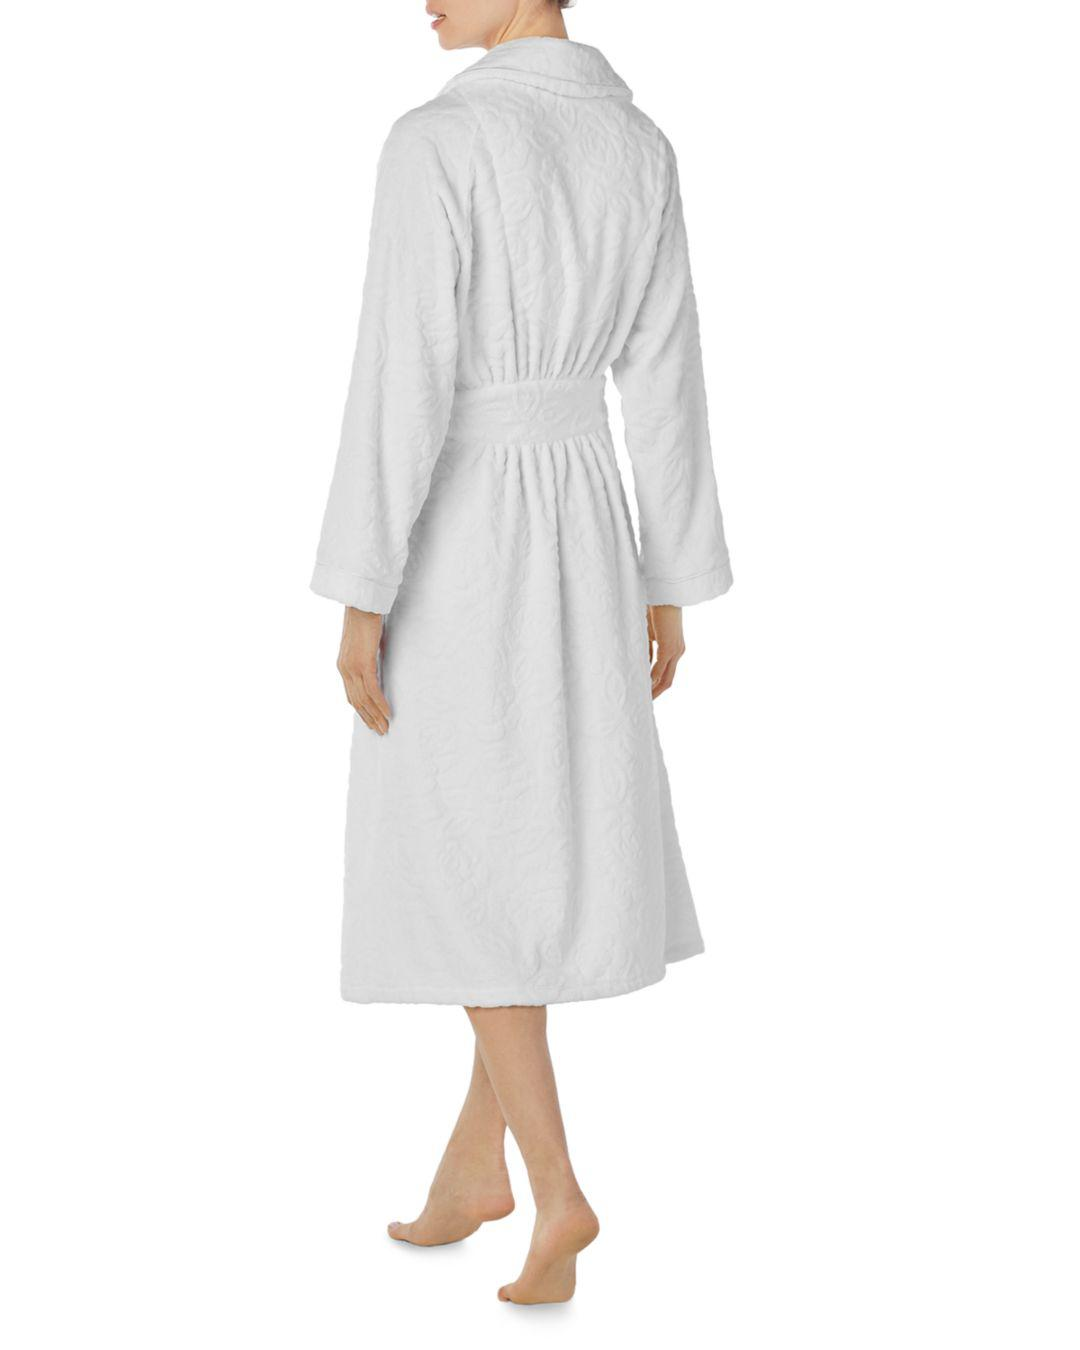 cb74ebe323 Lyst - Eileen West Ballet Wrap Robe in White - Save 6%